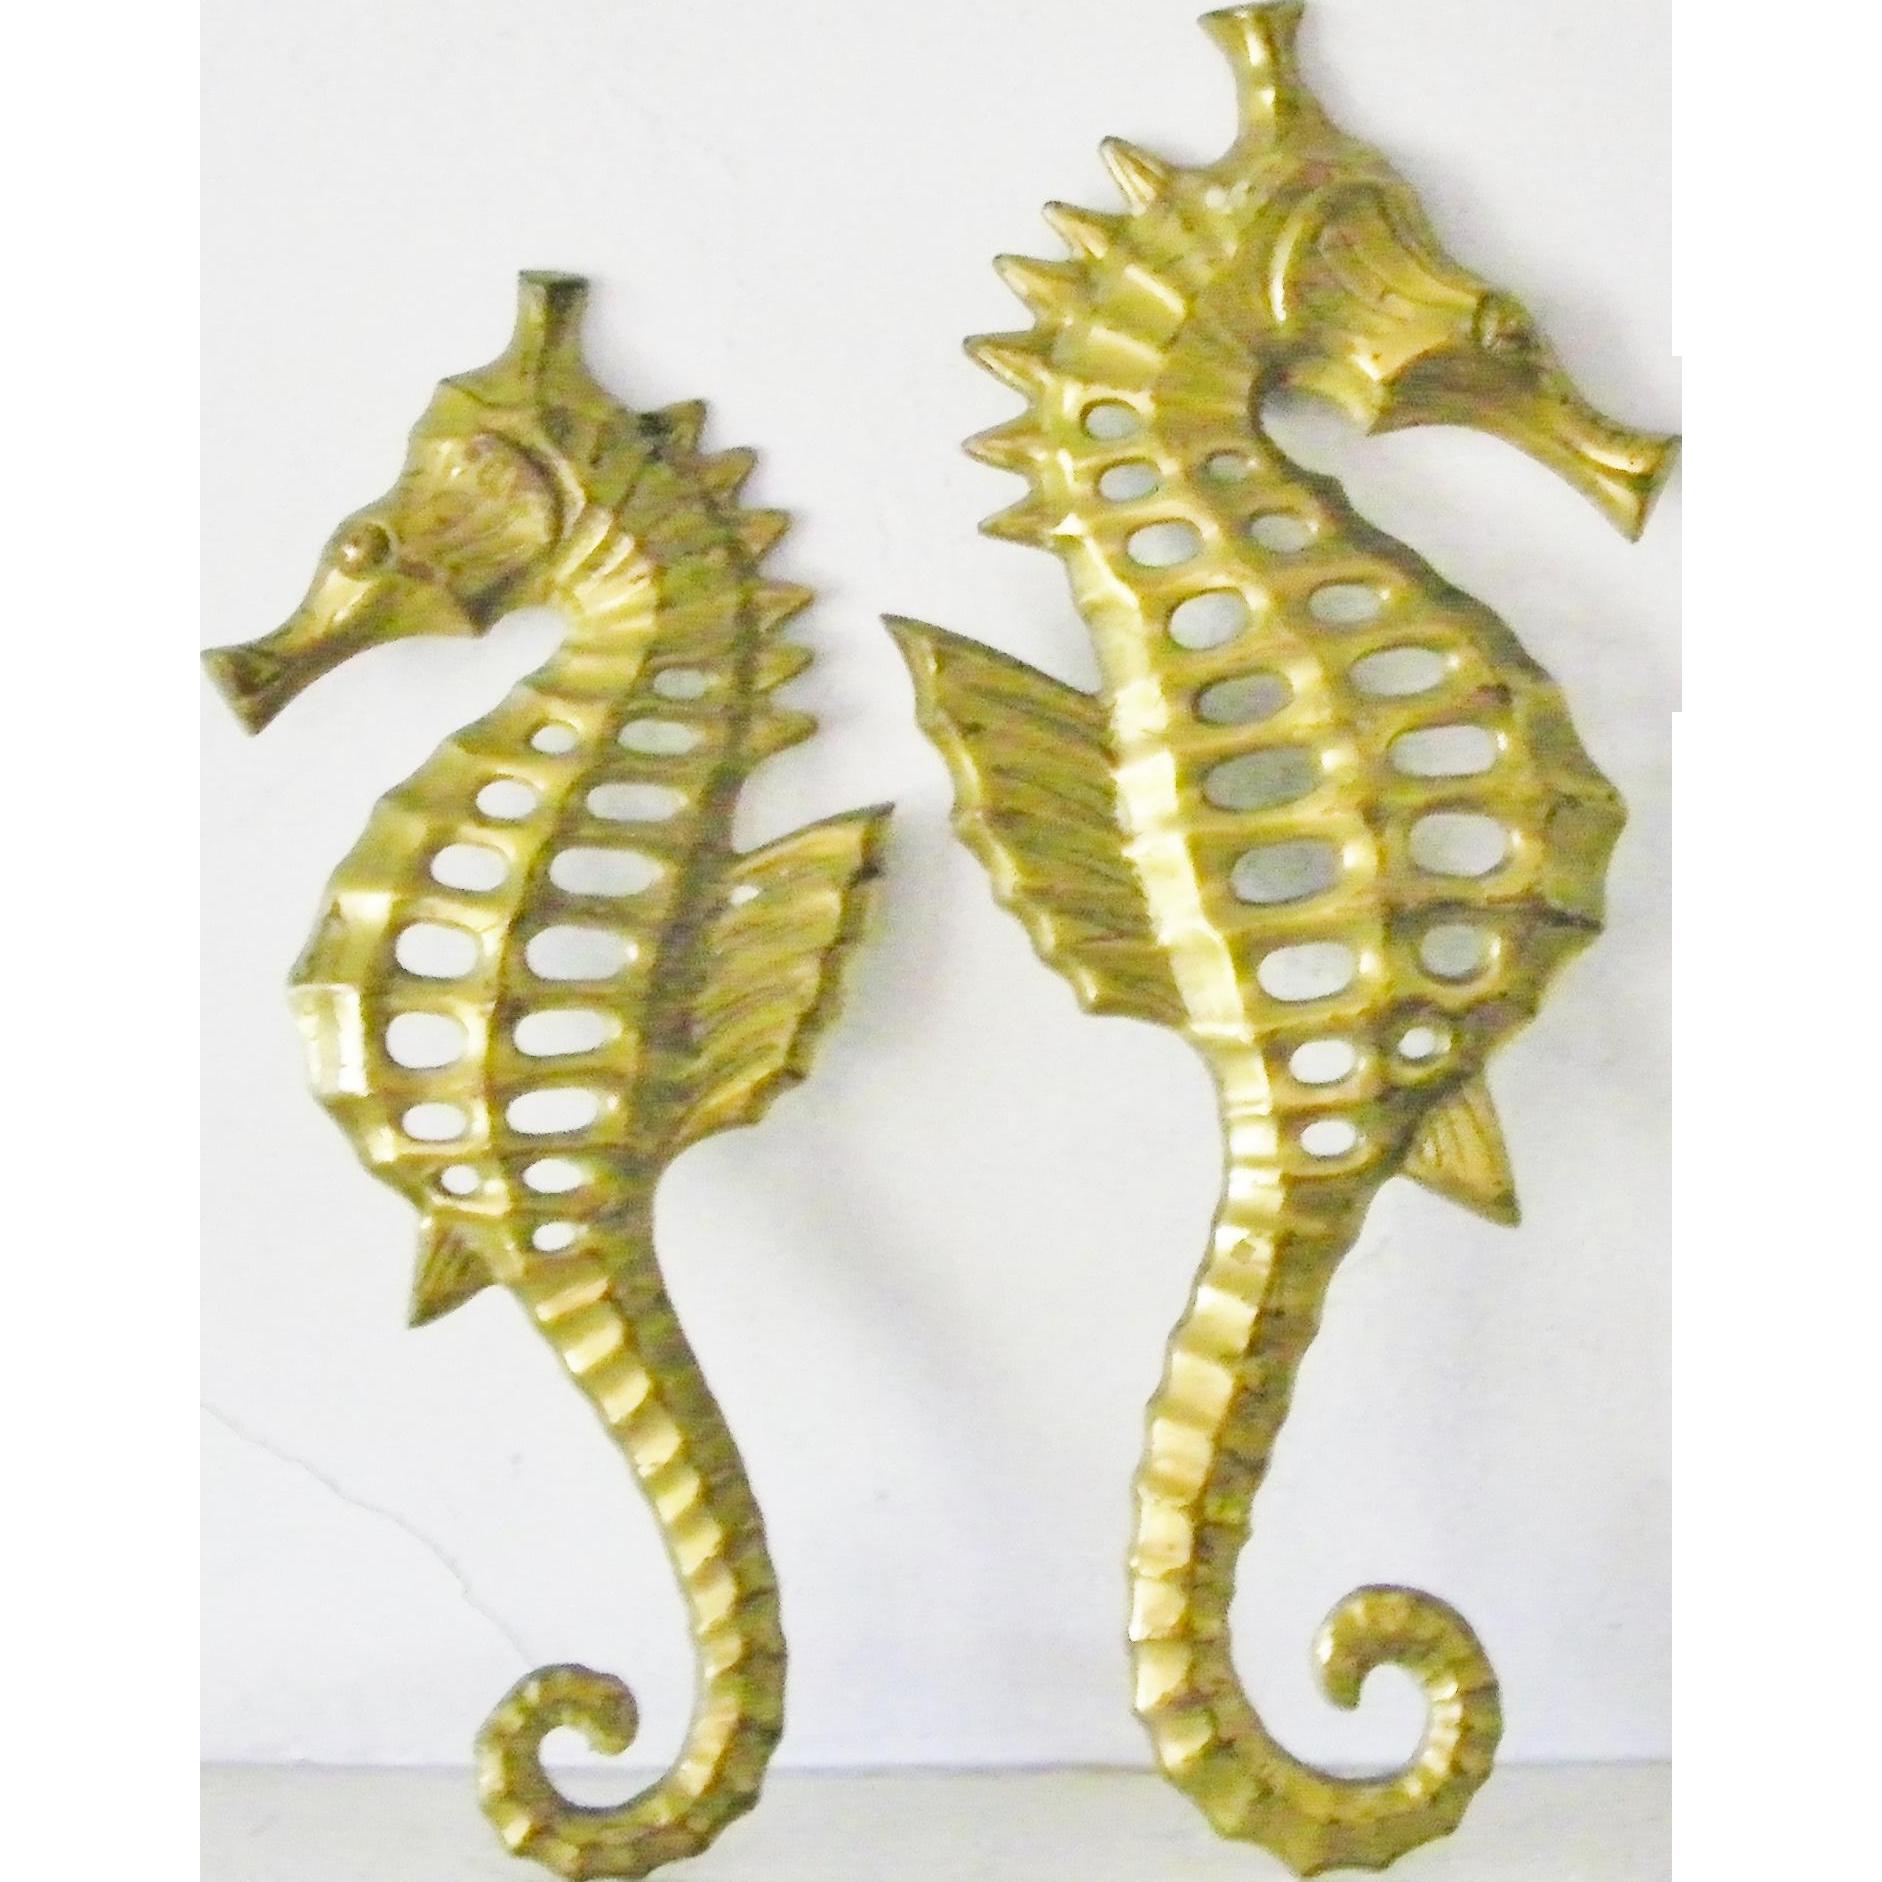 Seahorse Wall Decor pair of brass seahorse wall hanging decor sea horse figurine